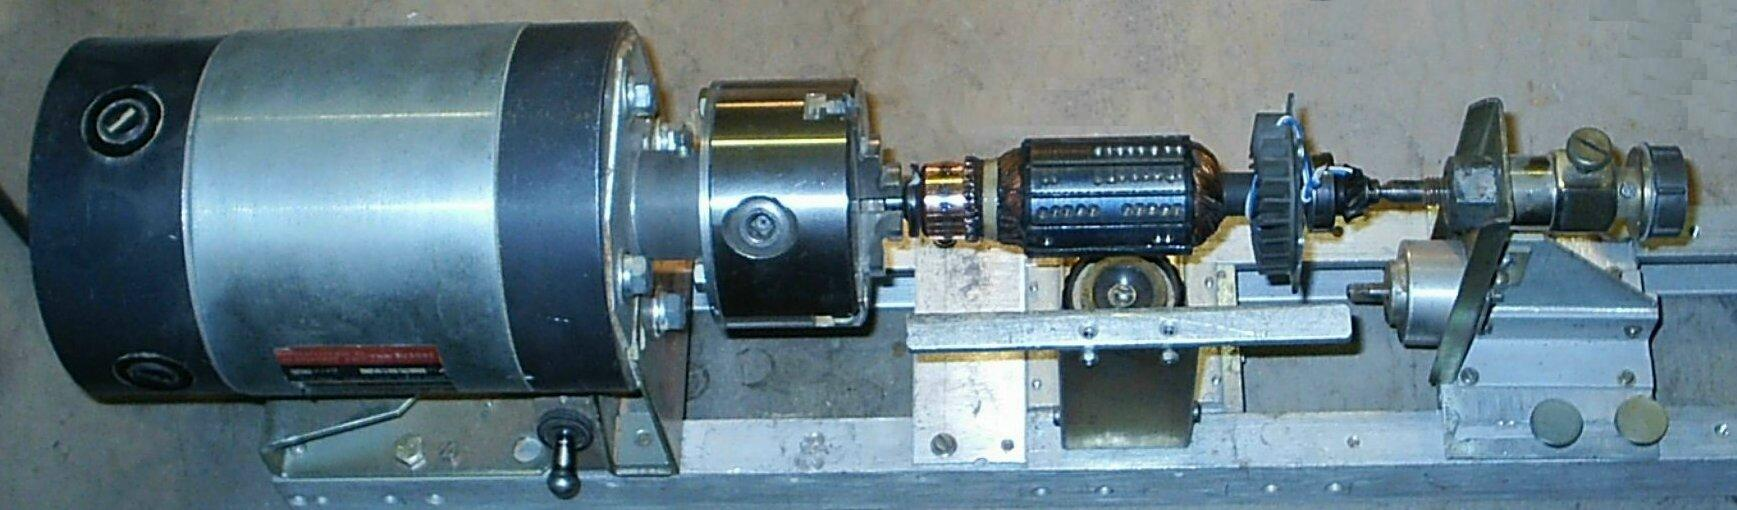 схема на электрокофемолку экму 50 модель 2